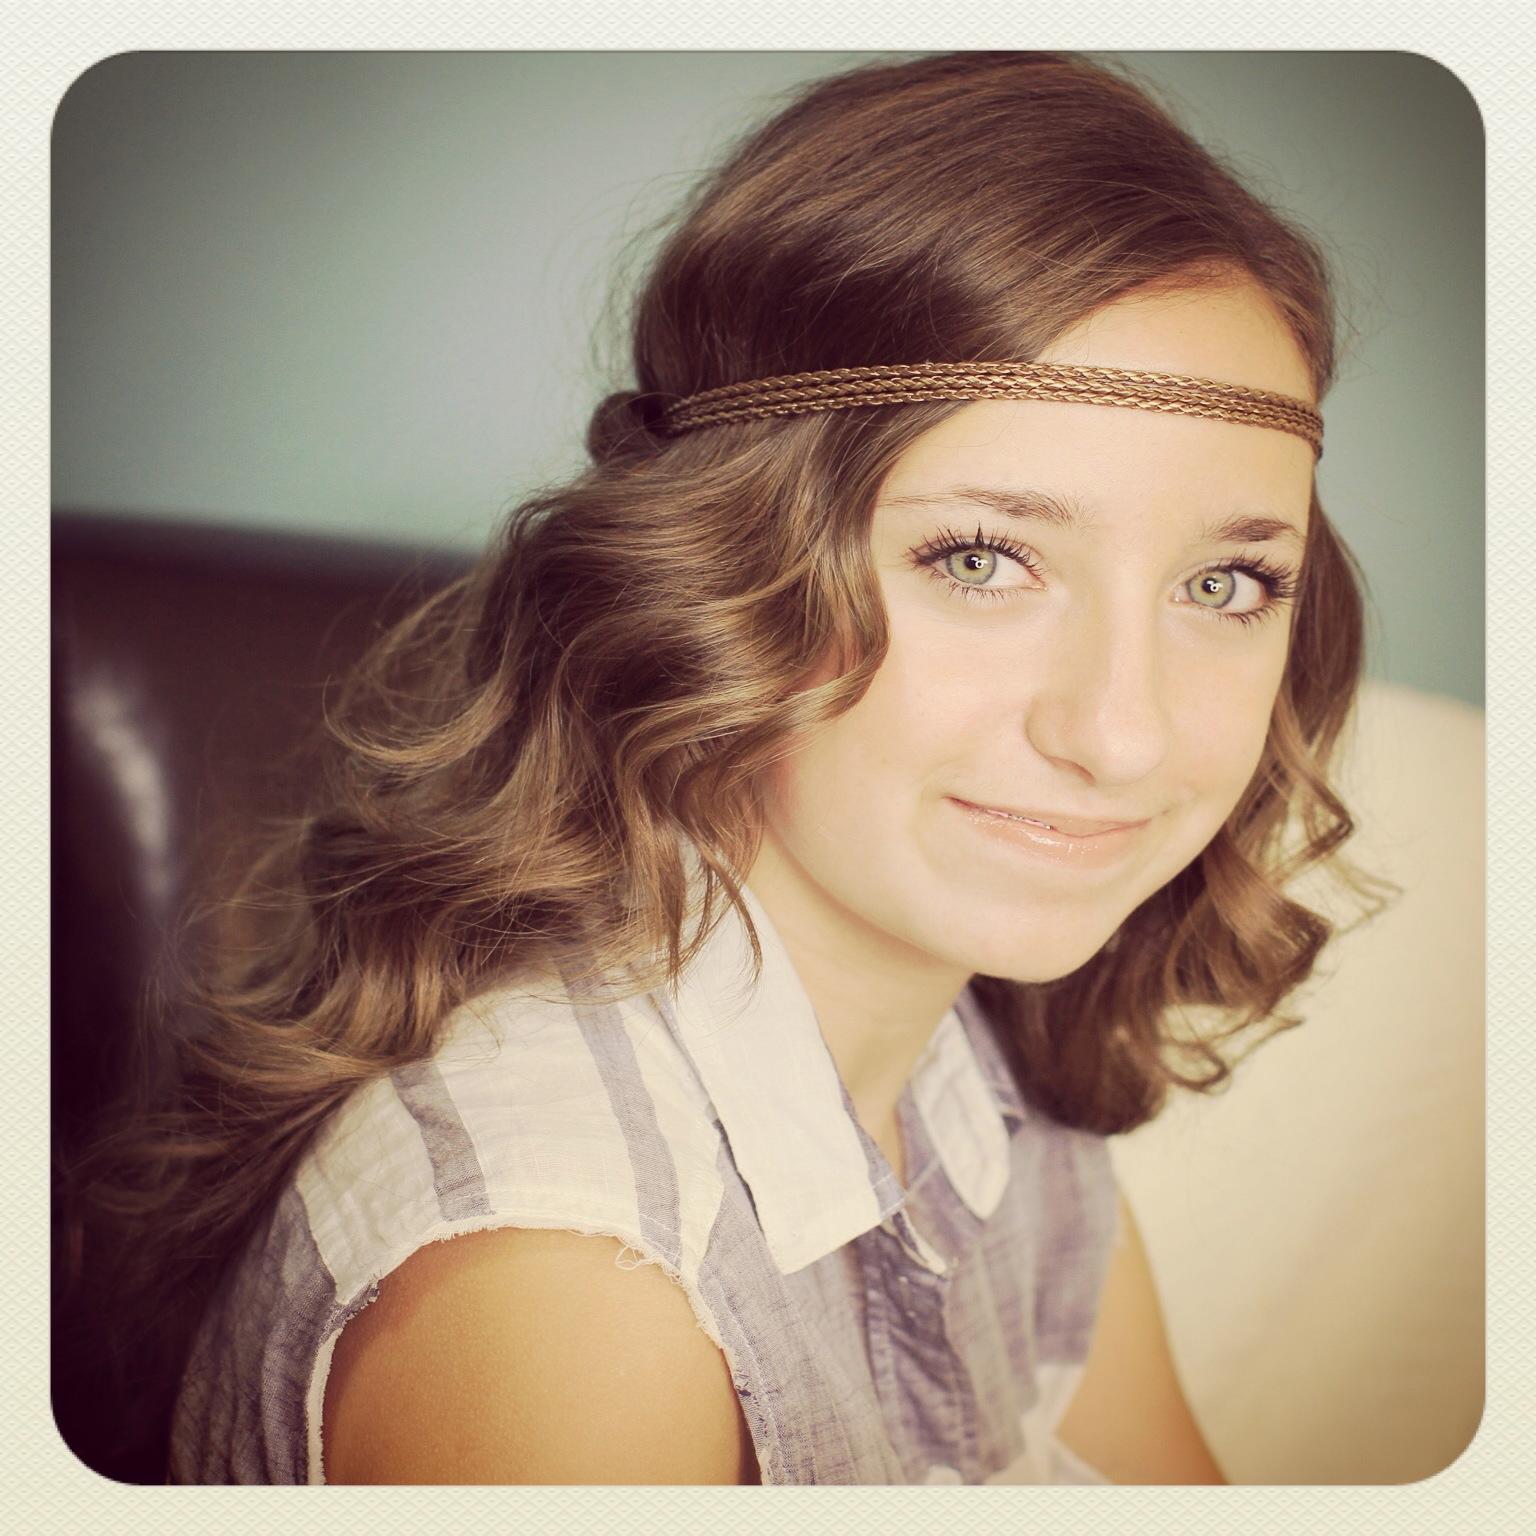 headband-twist-half-up-half-down-hairstyles-cute-girls-hairstyles-for-headband-hairstyles-v-cut-and-u-cut-hairstyles headband-twist-half-up-half-down-hairstyles-cute-girls-hairstyles-for-headband-hairstyles-v-cut-and-u-cut-hairstyles